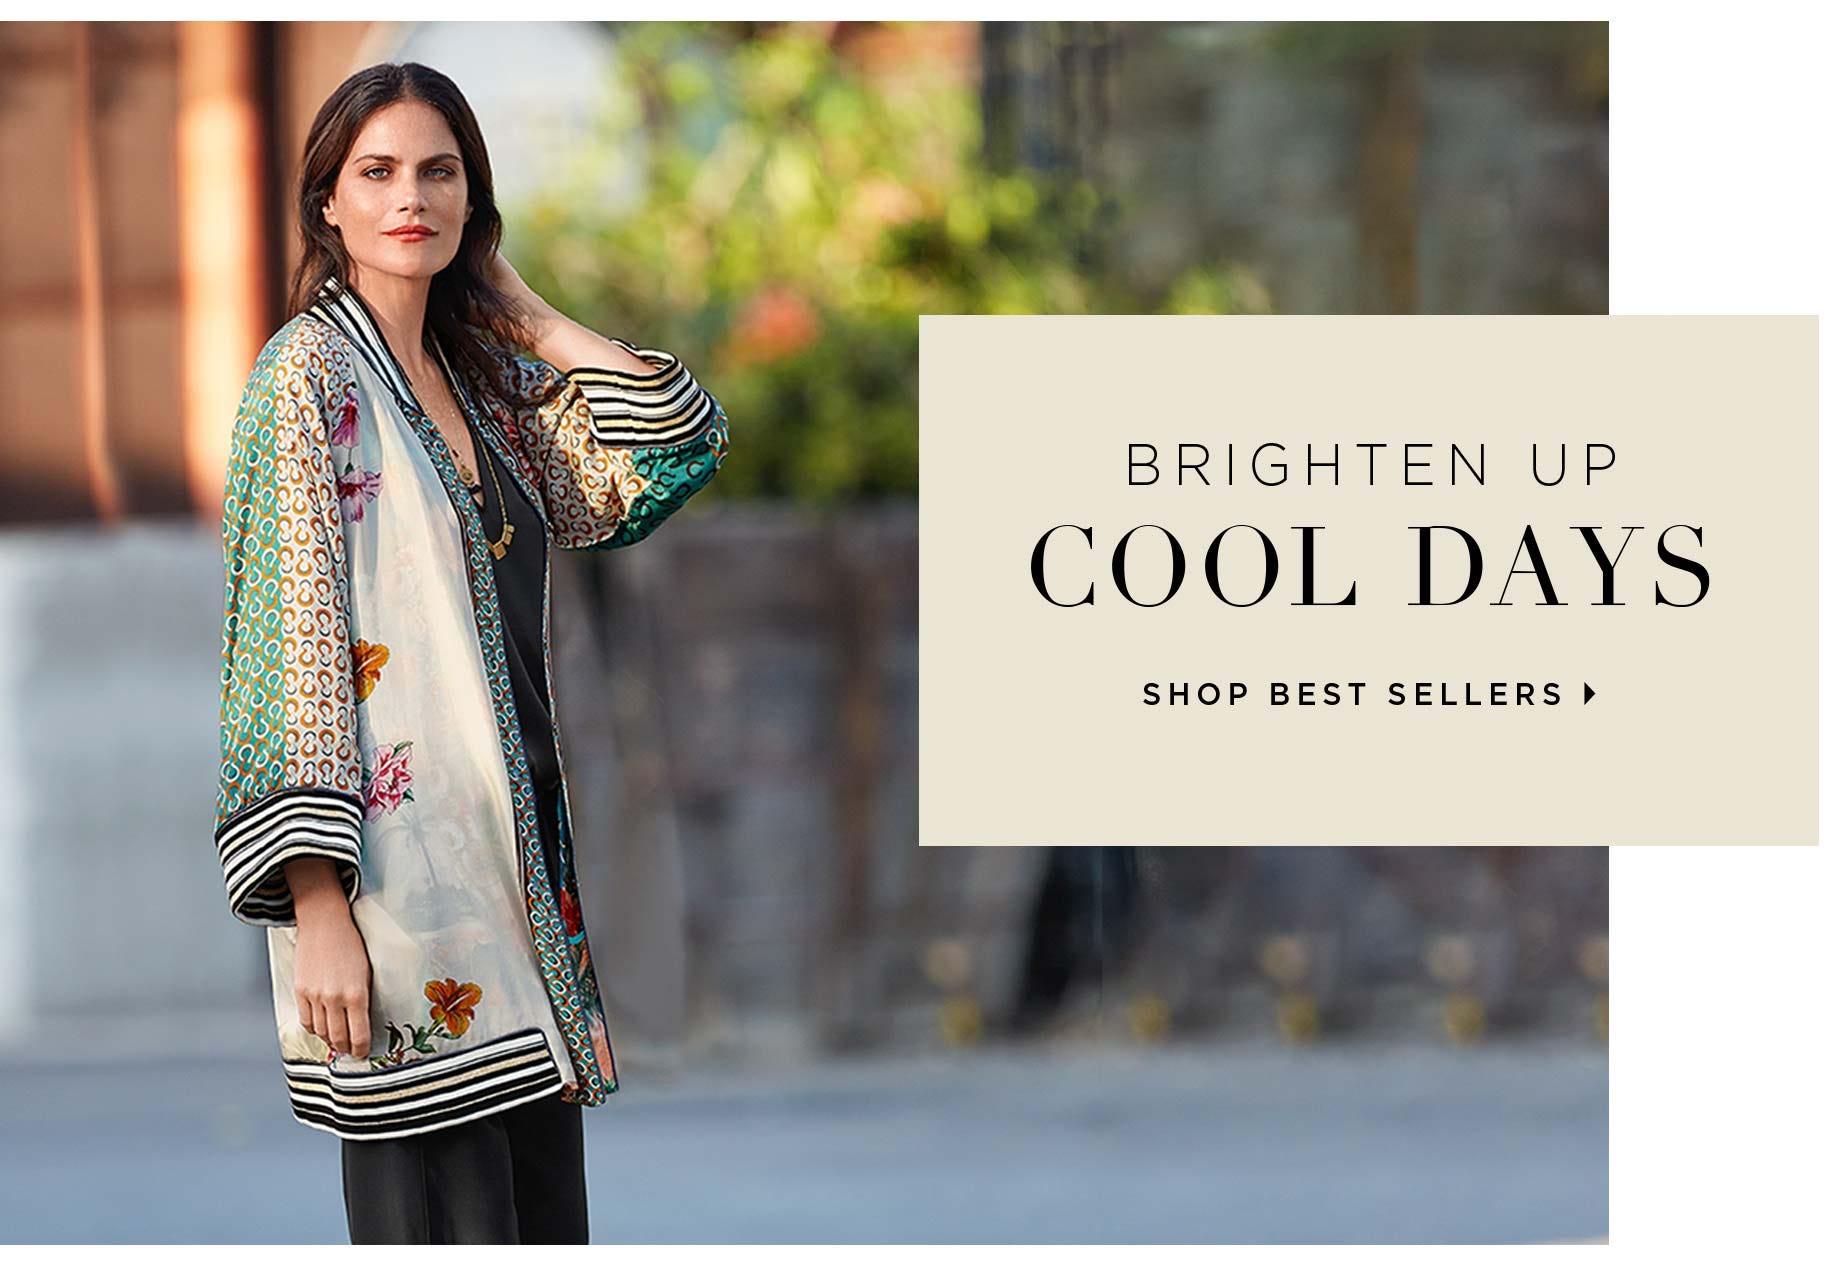 Brighten up cool days - Shop Best Sellers